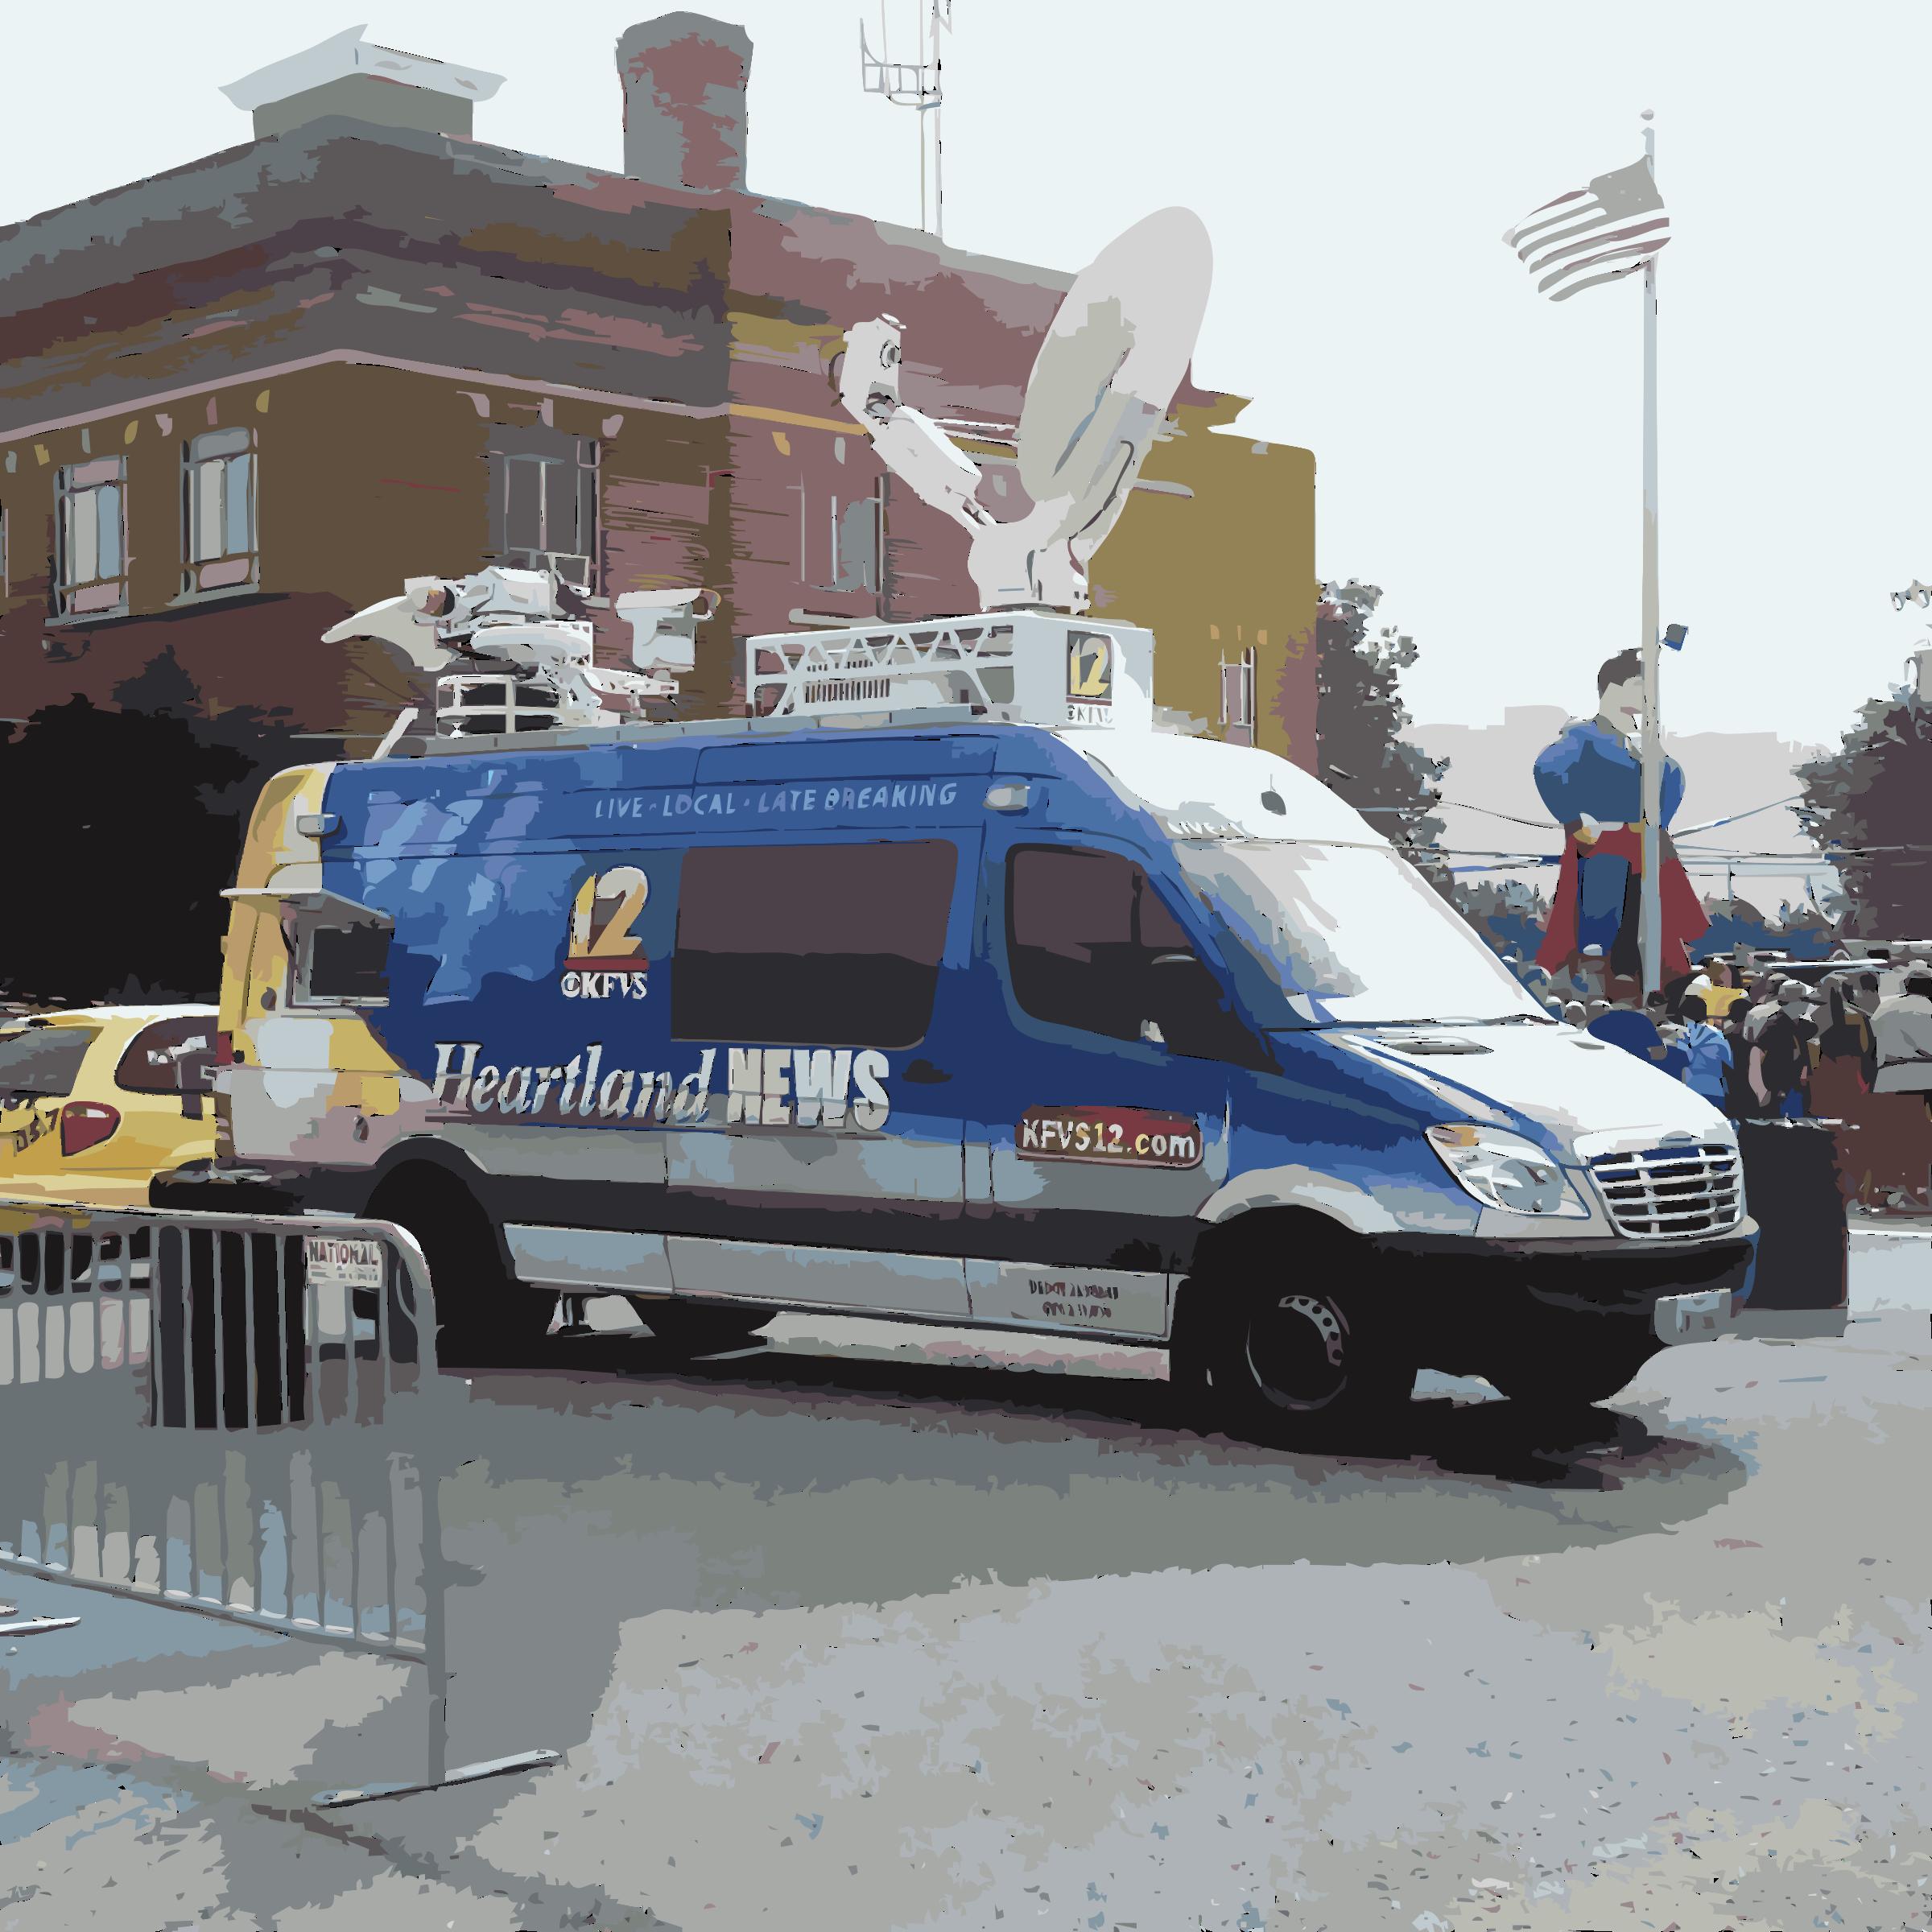 News van. Minivan clipart land transportation